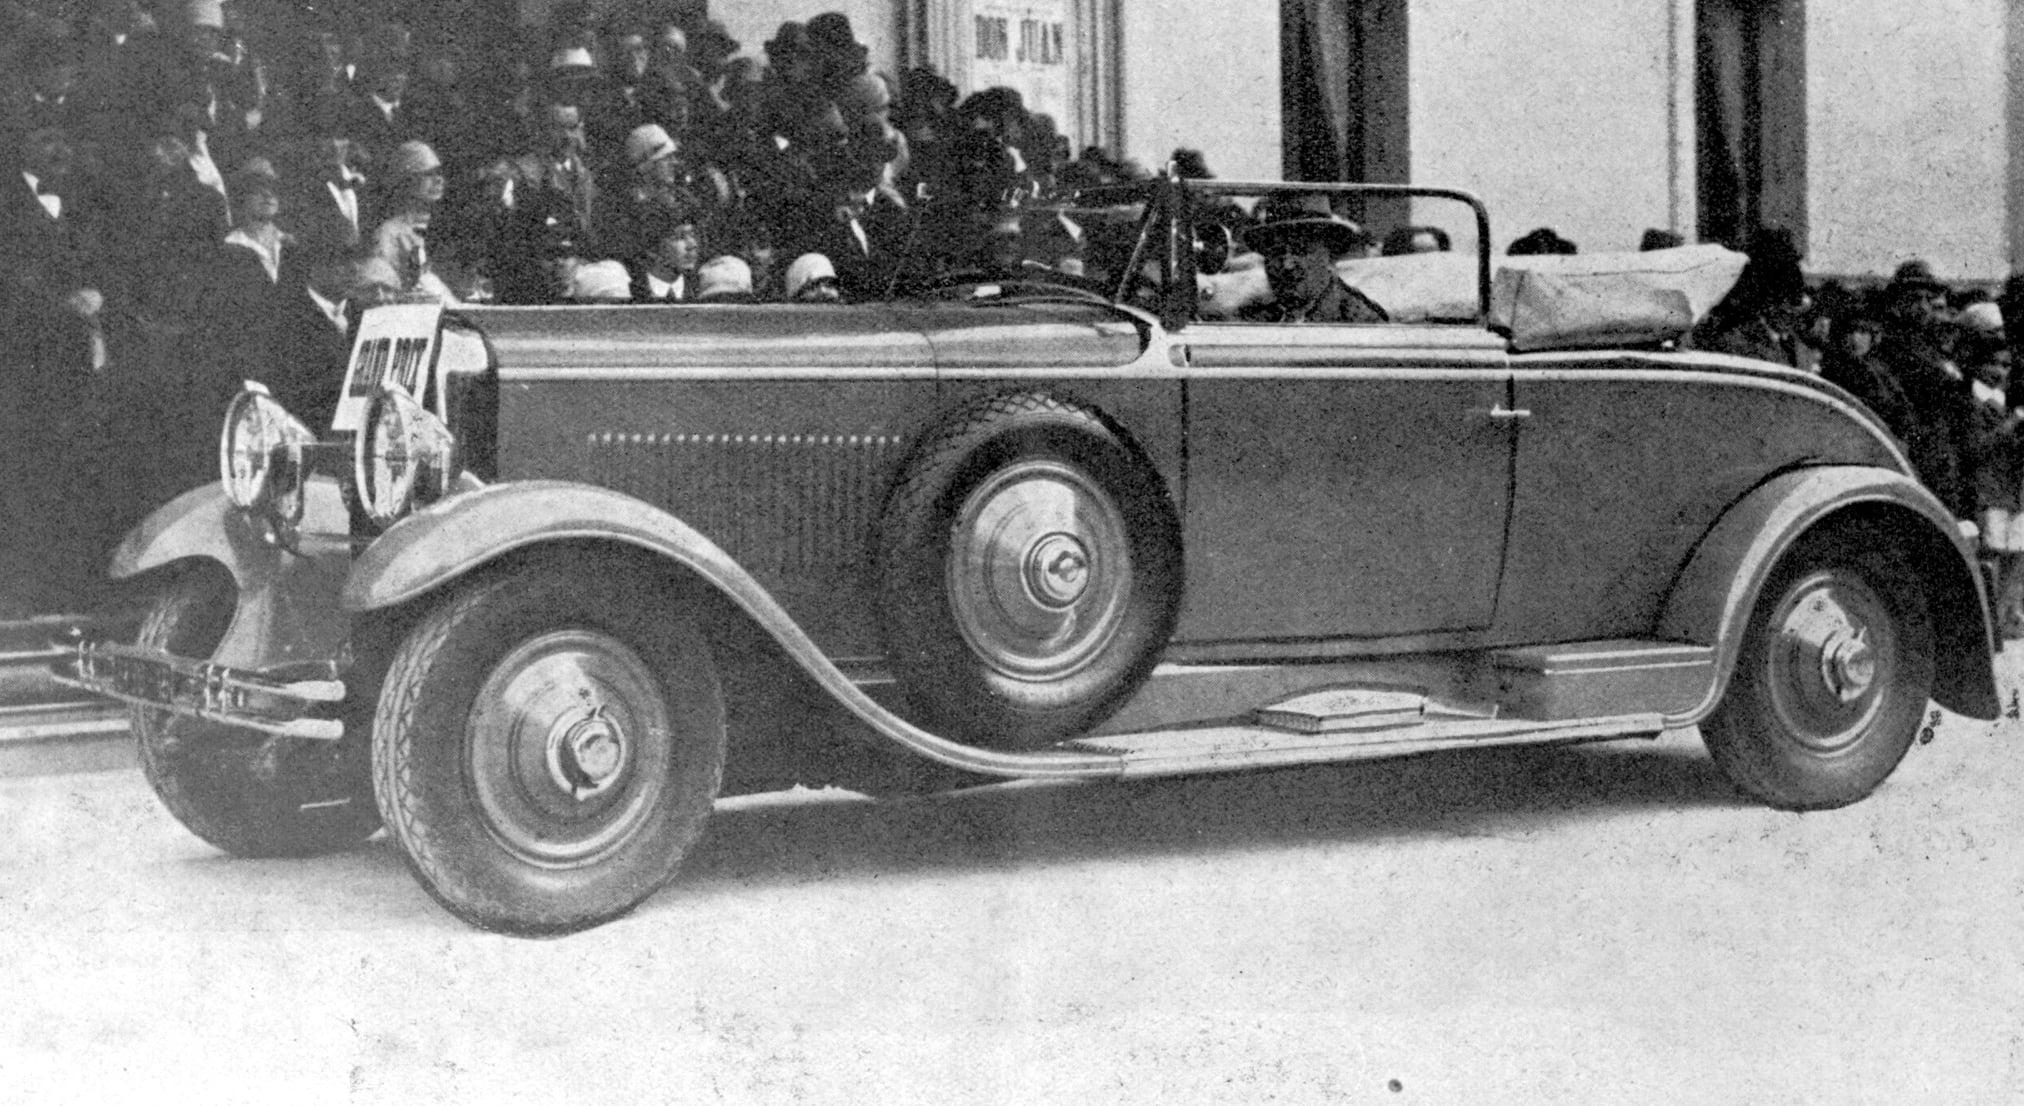 Peugeot-n-54-Cabriolet-Duvivier-de-M-Artault-Grand-Prix-Maart-1928